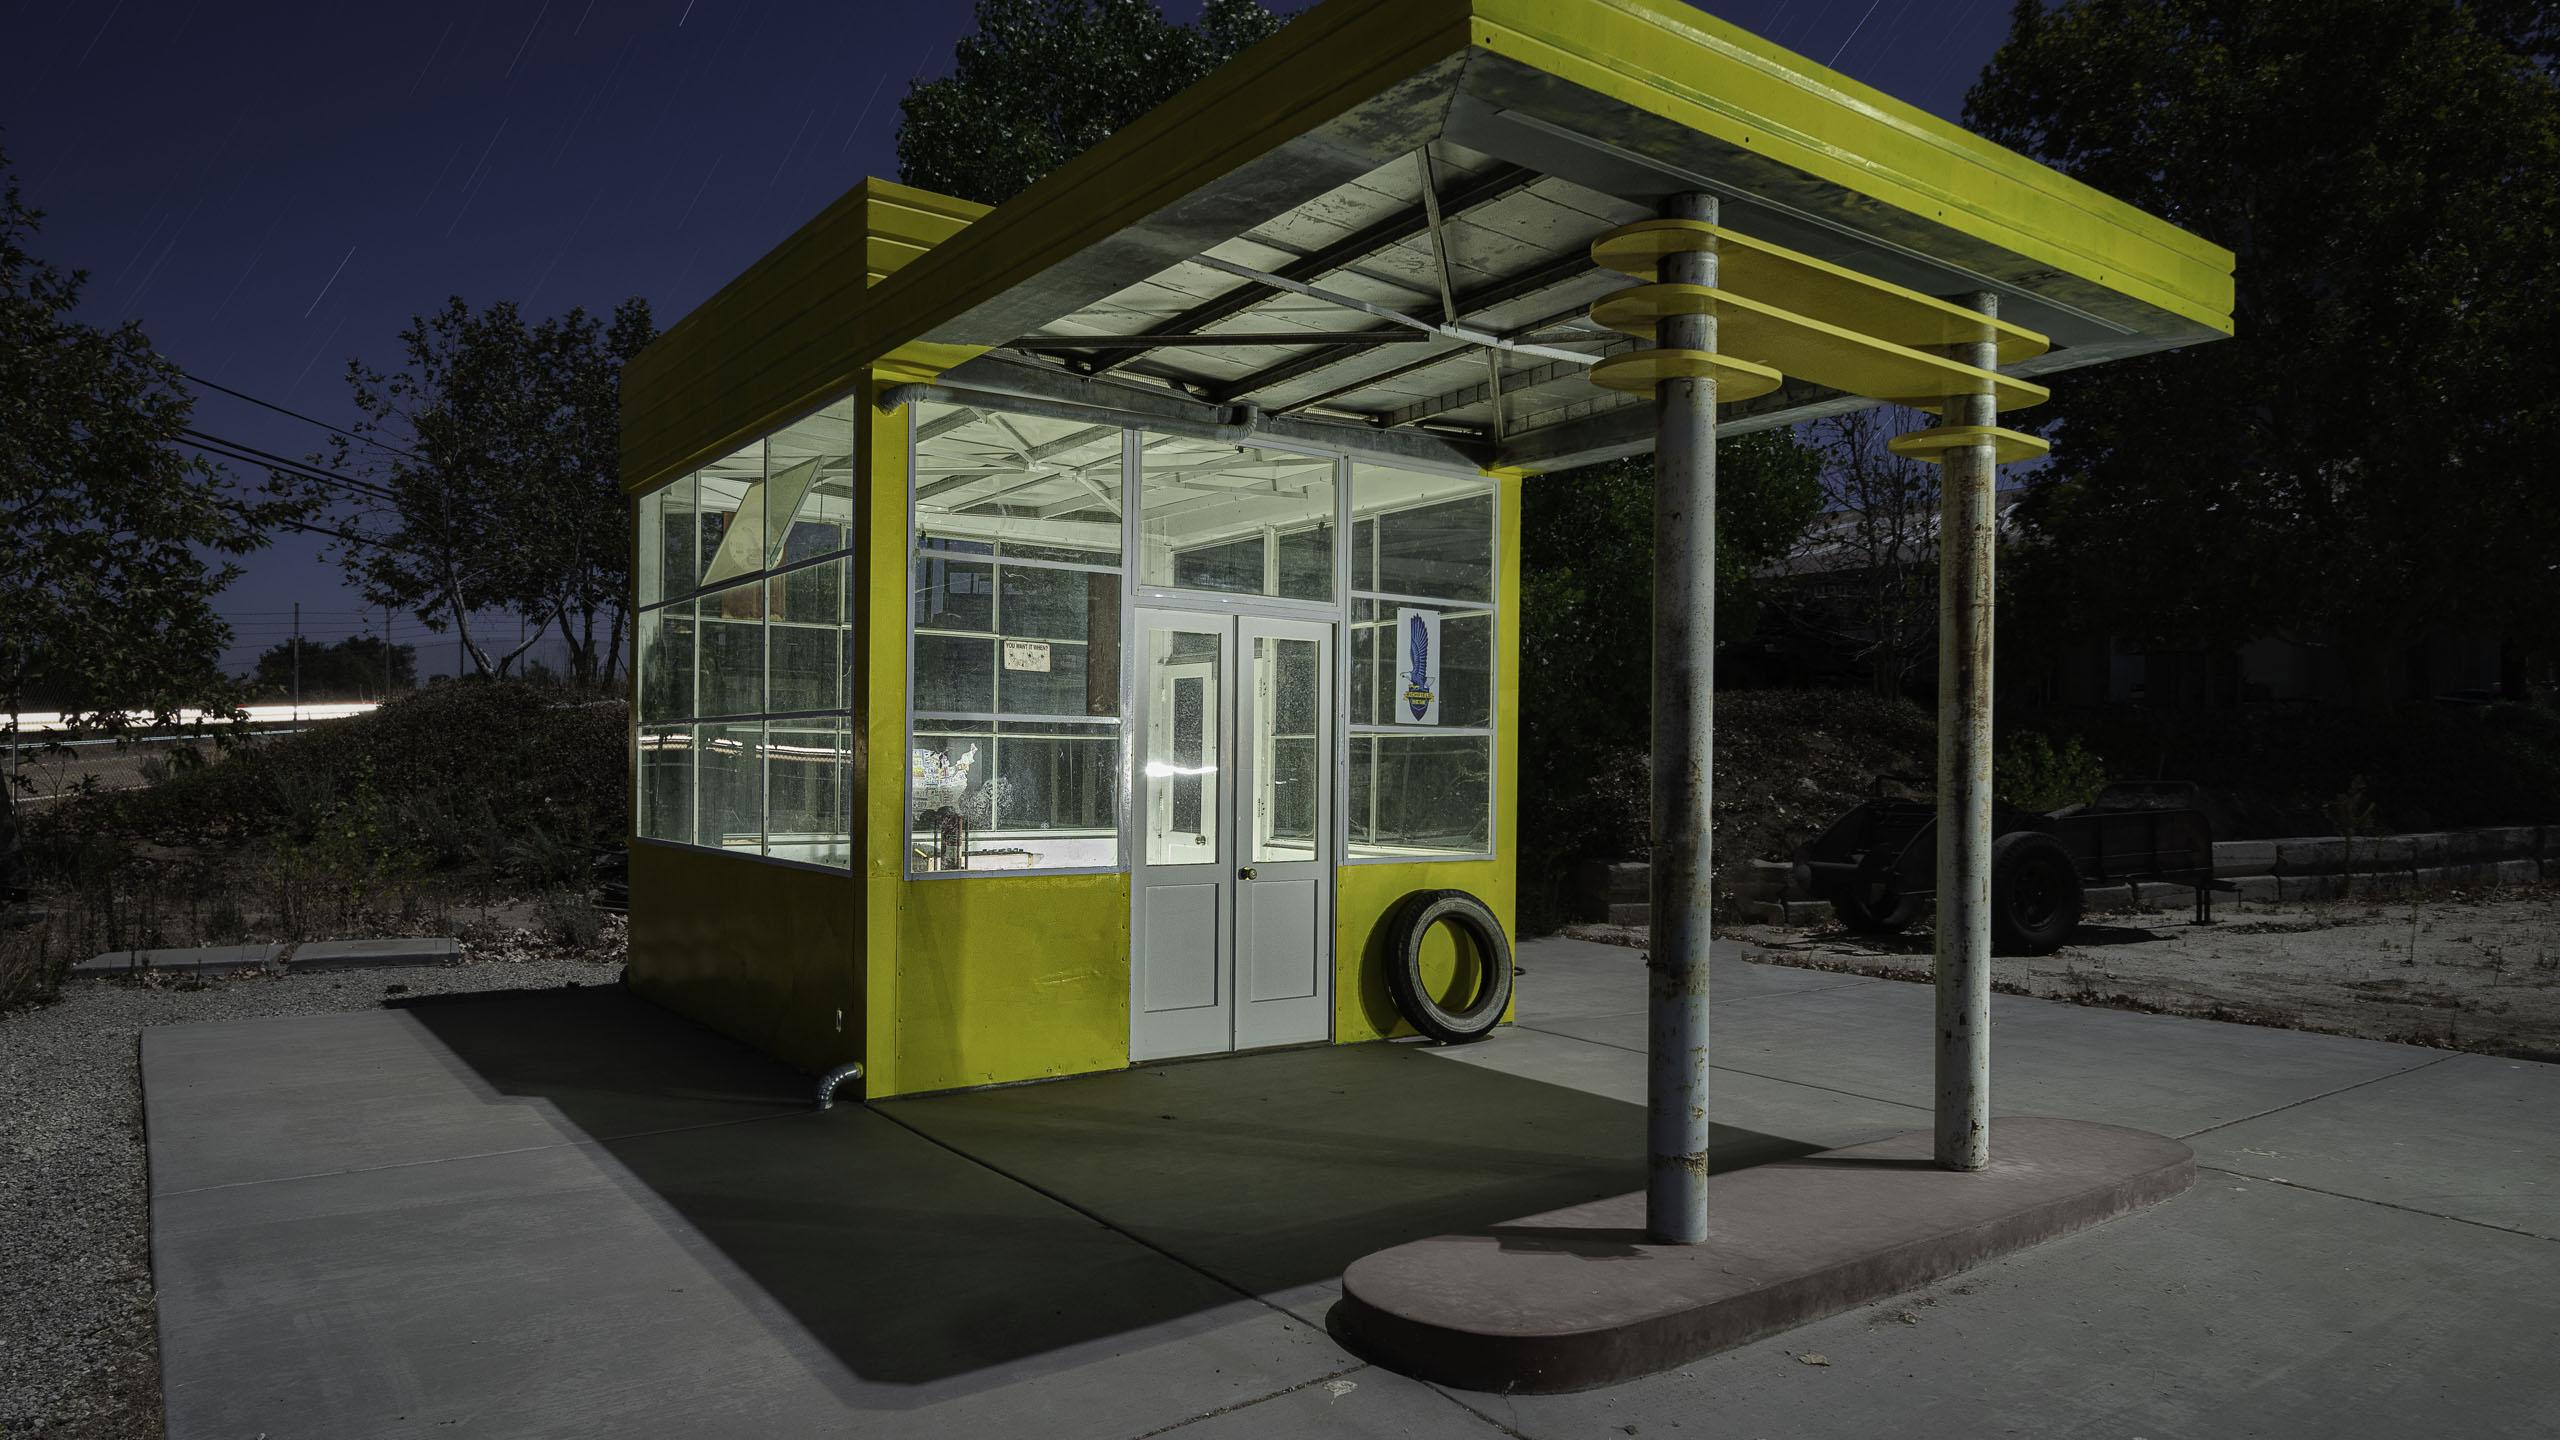 2792_kenlee_motortransportmuseum_201004_0238_12mtotal-3mf8iso200_yellow-service-station-corner-startrails_2560x1440px-HEADER-PHOTOFOCUS